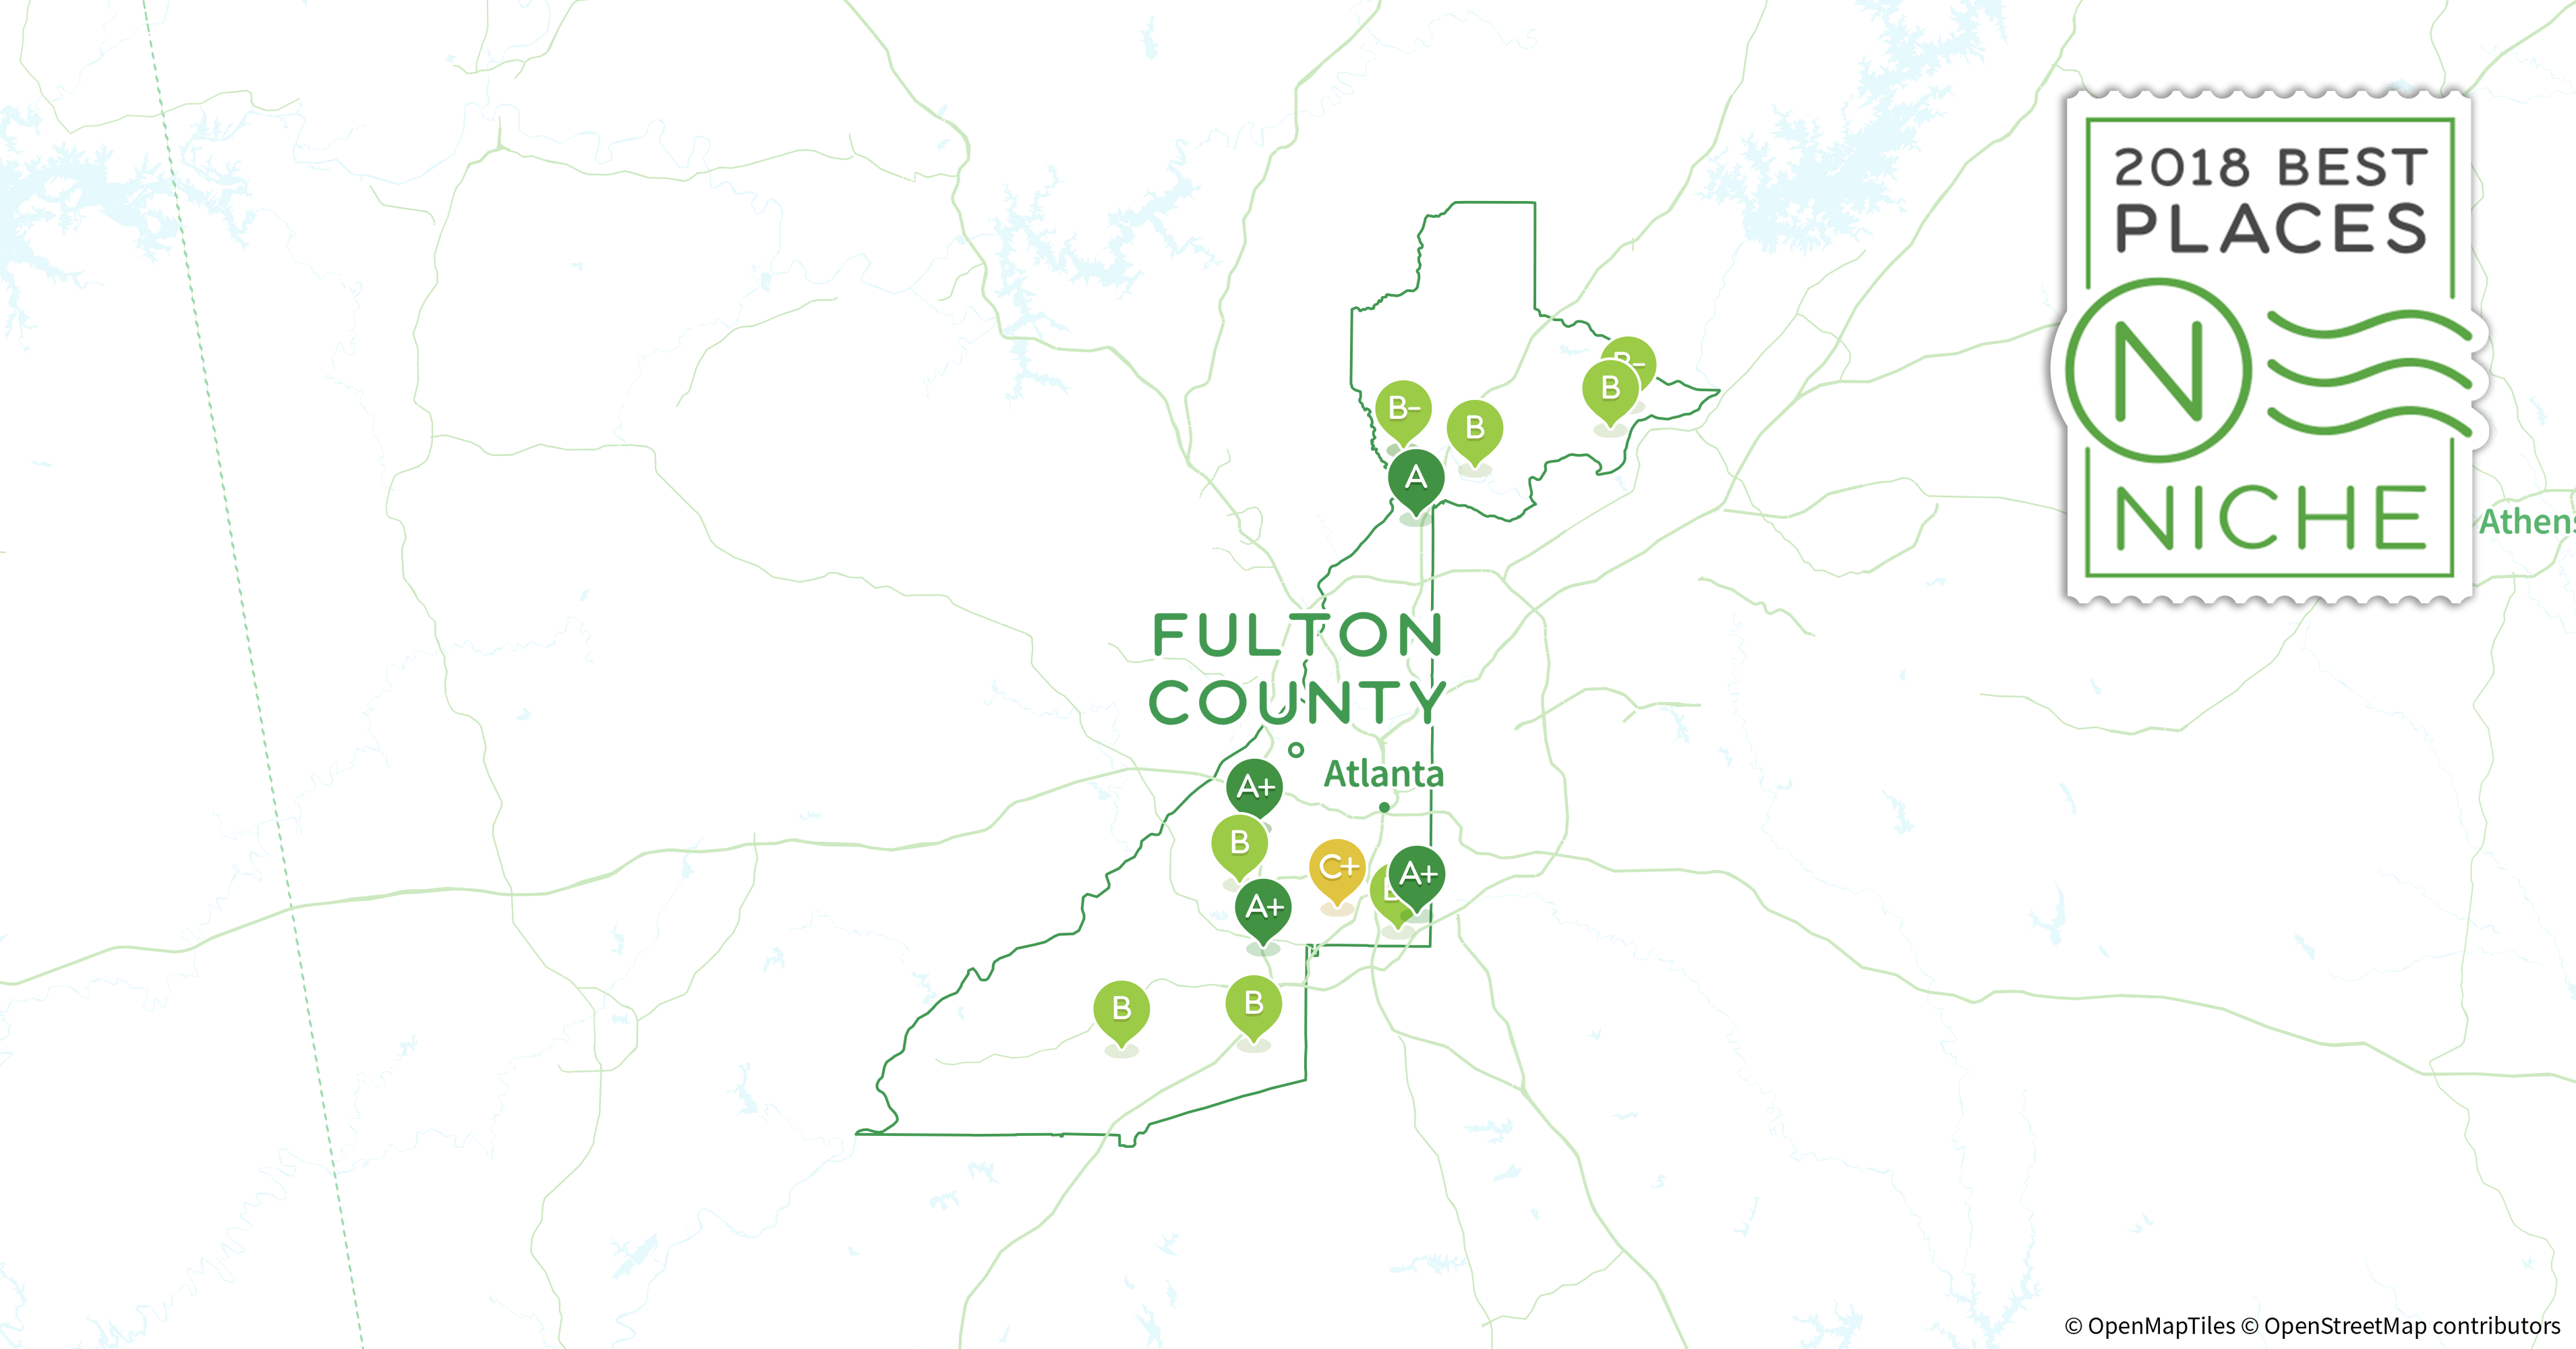 2018 Safest Places to Live in Fulton County, GA - Niche